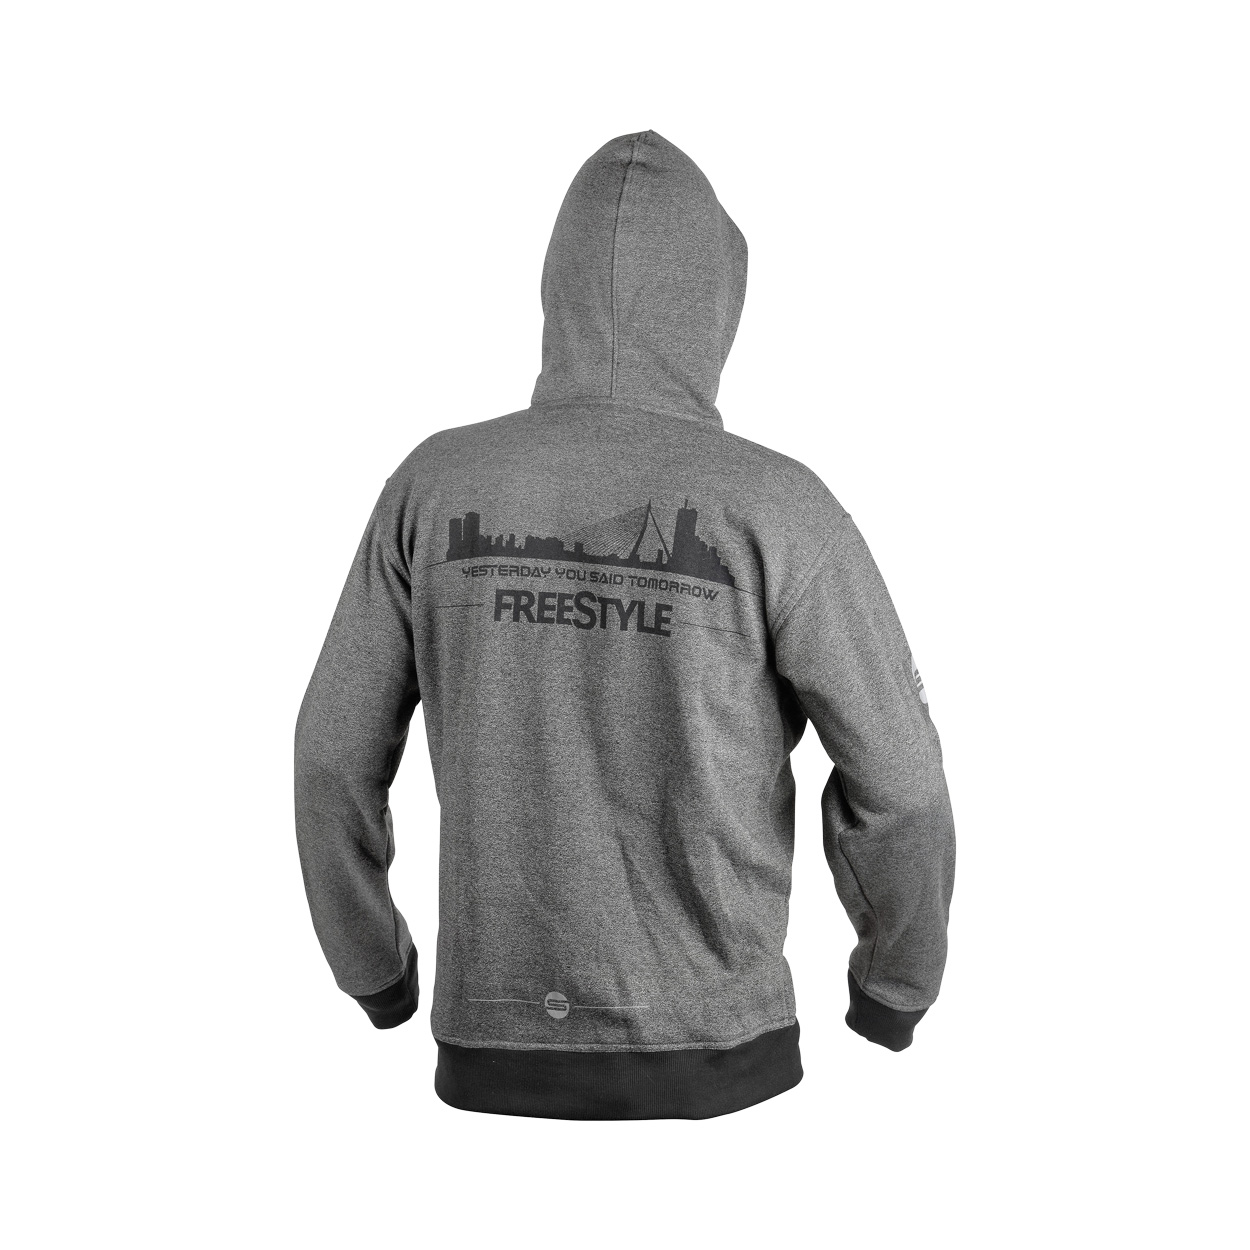 Freestyle - Hoodie - 01